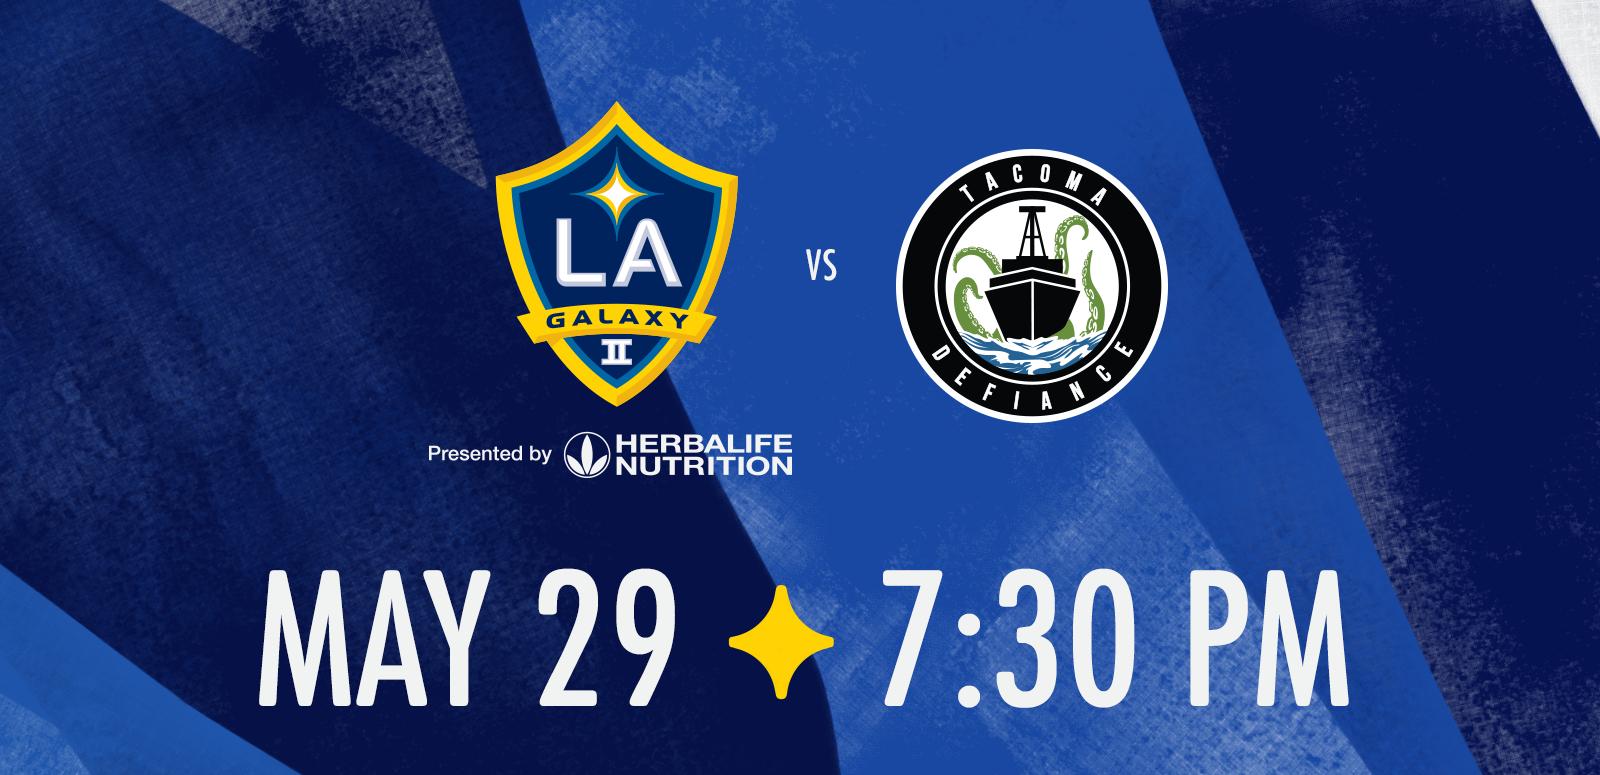 LA Galaxy II vs. Tacoma Defiance